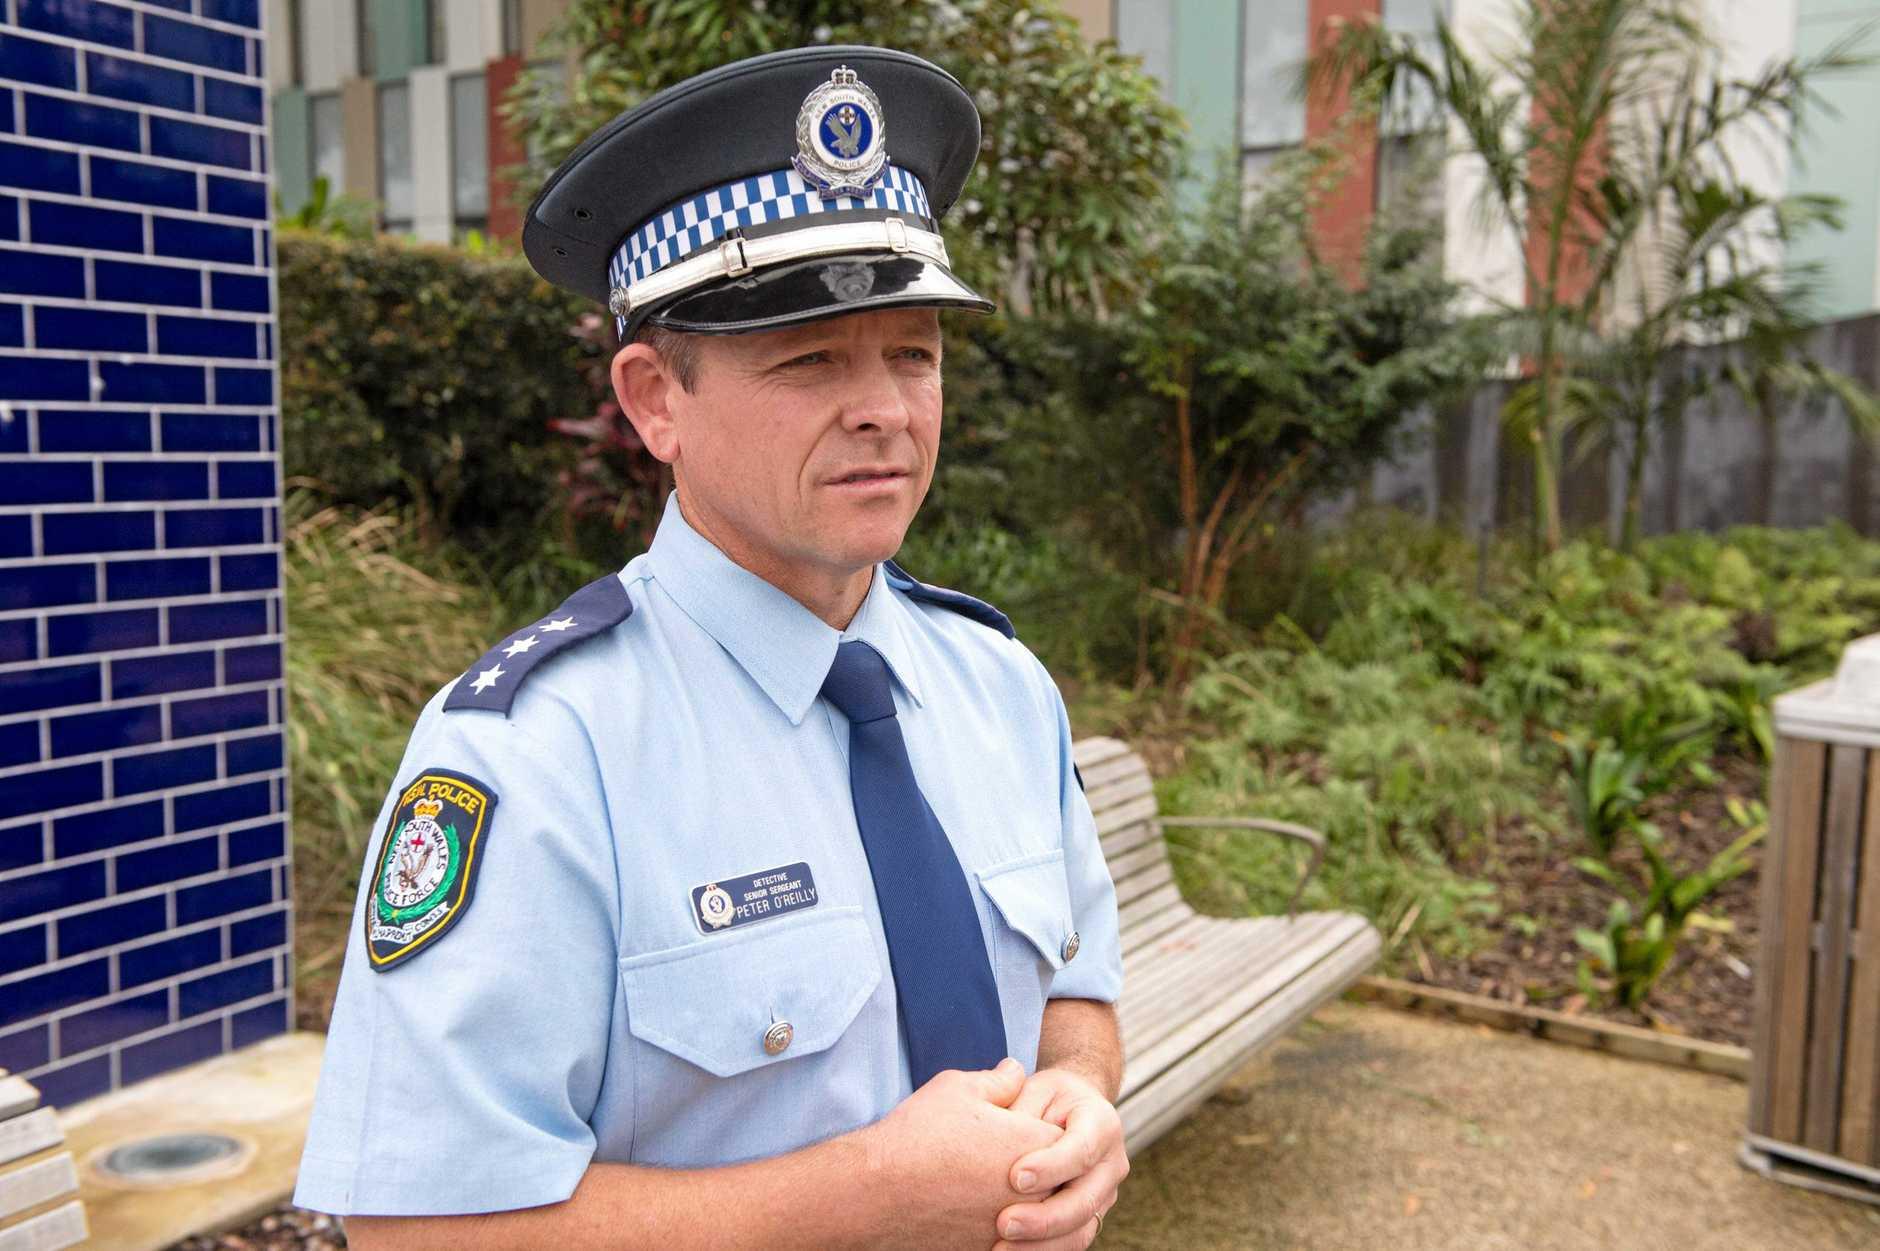 Detective Senior Sergeant Peter O'Reilly. 06 JULY 2018